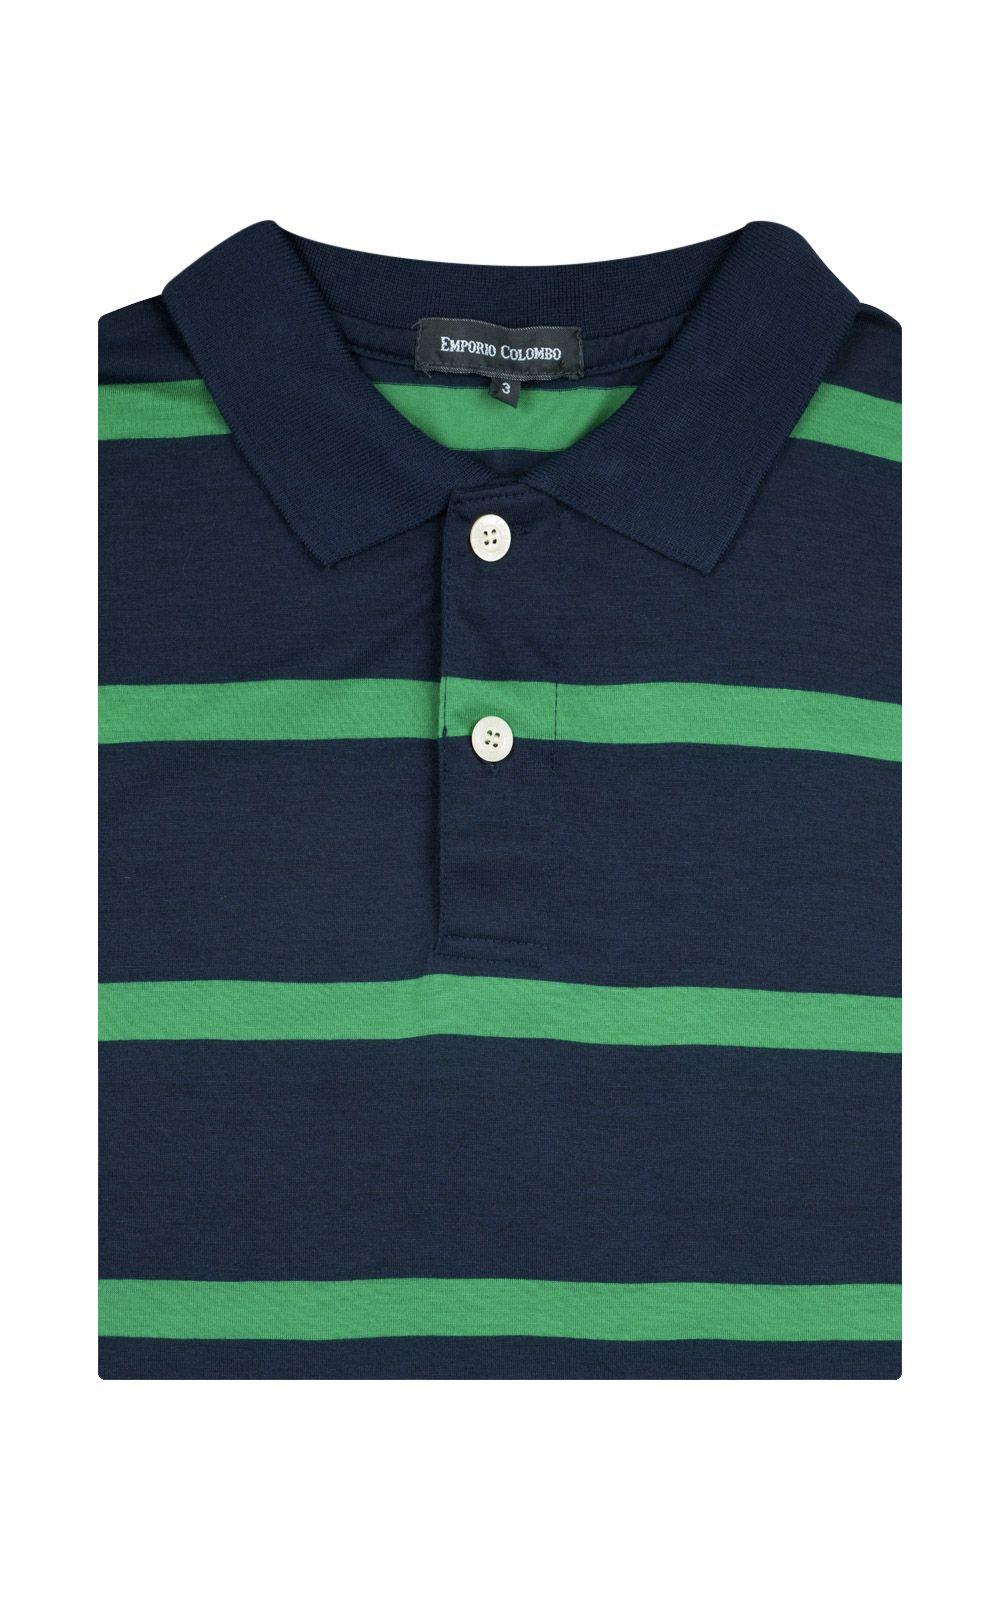 Foto 4 - Camisa Polo Masculina Azul Marinho Listrada